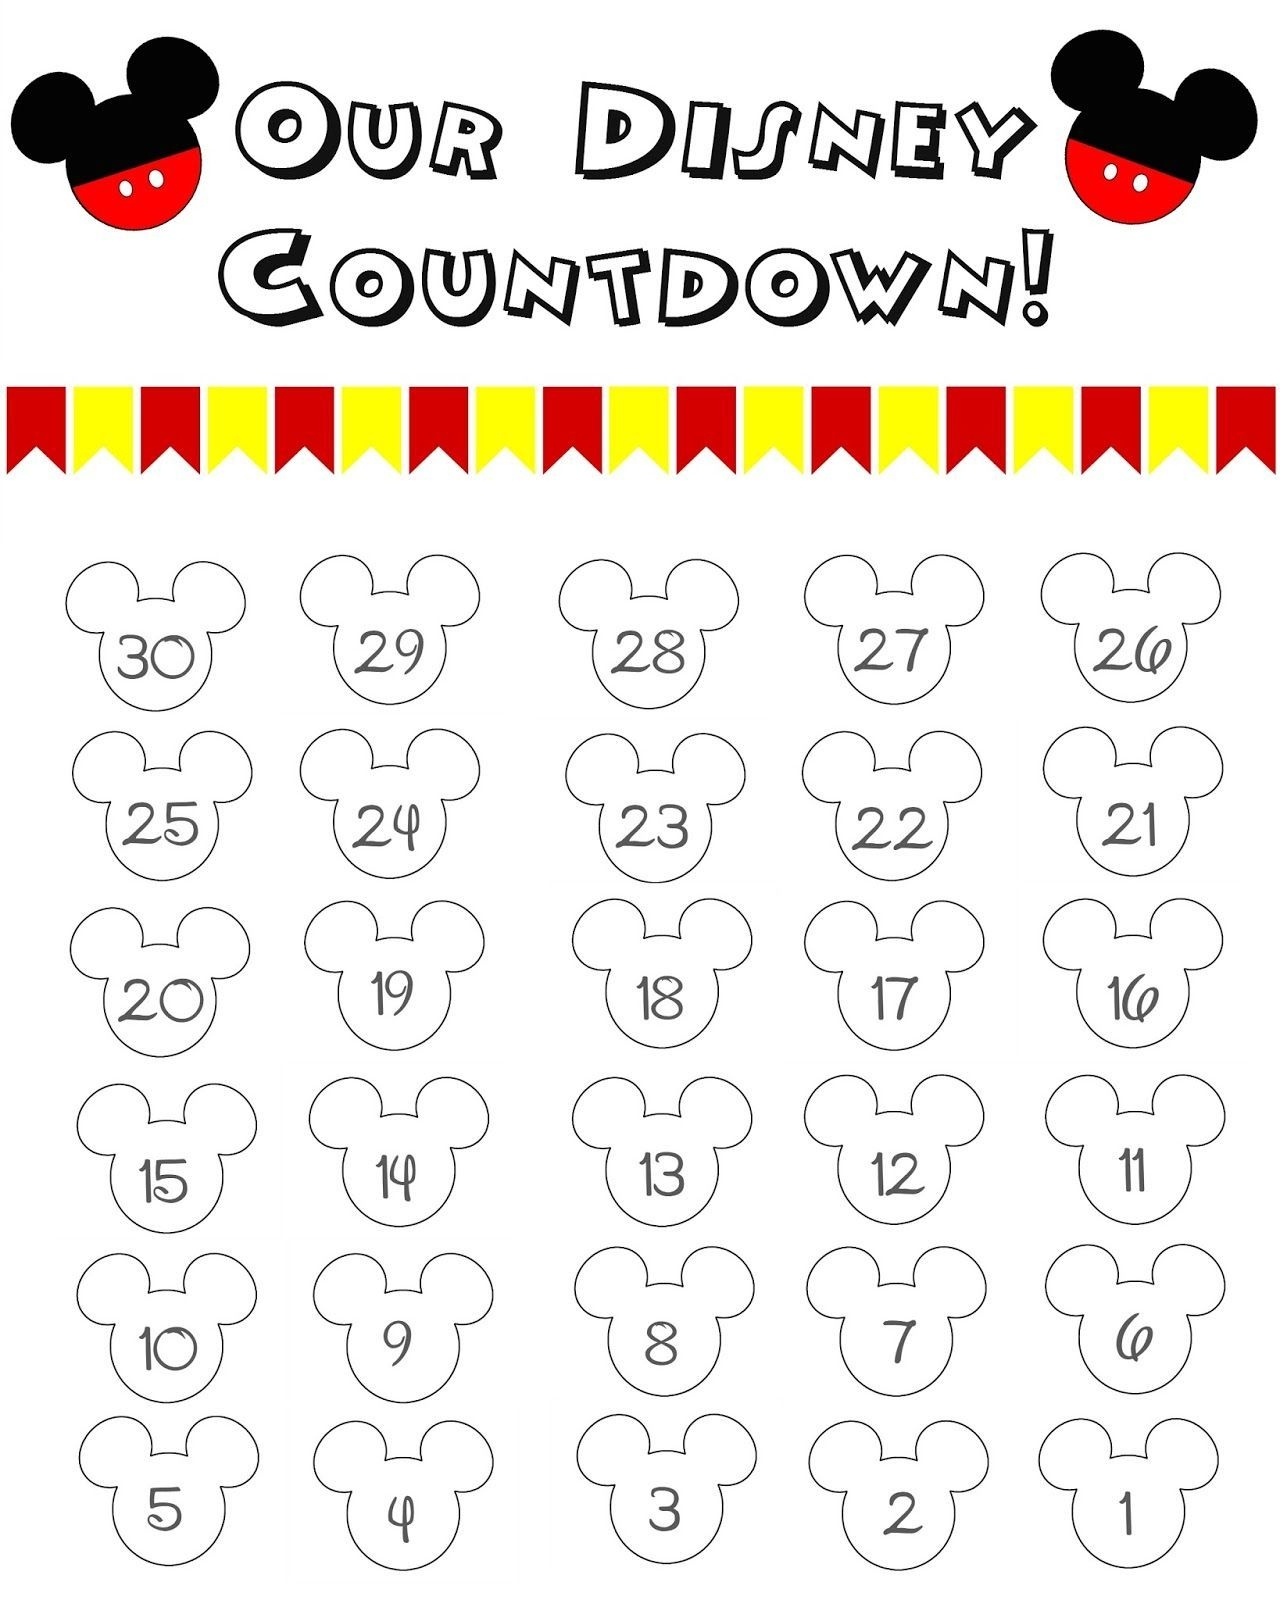 disney world countdown calendar free printable!! the